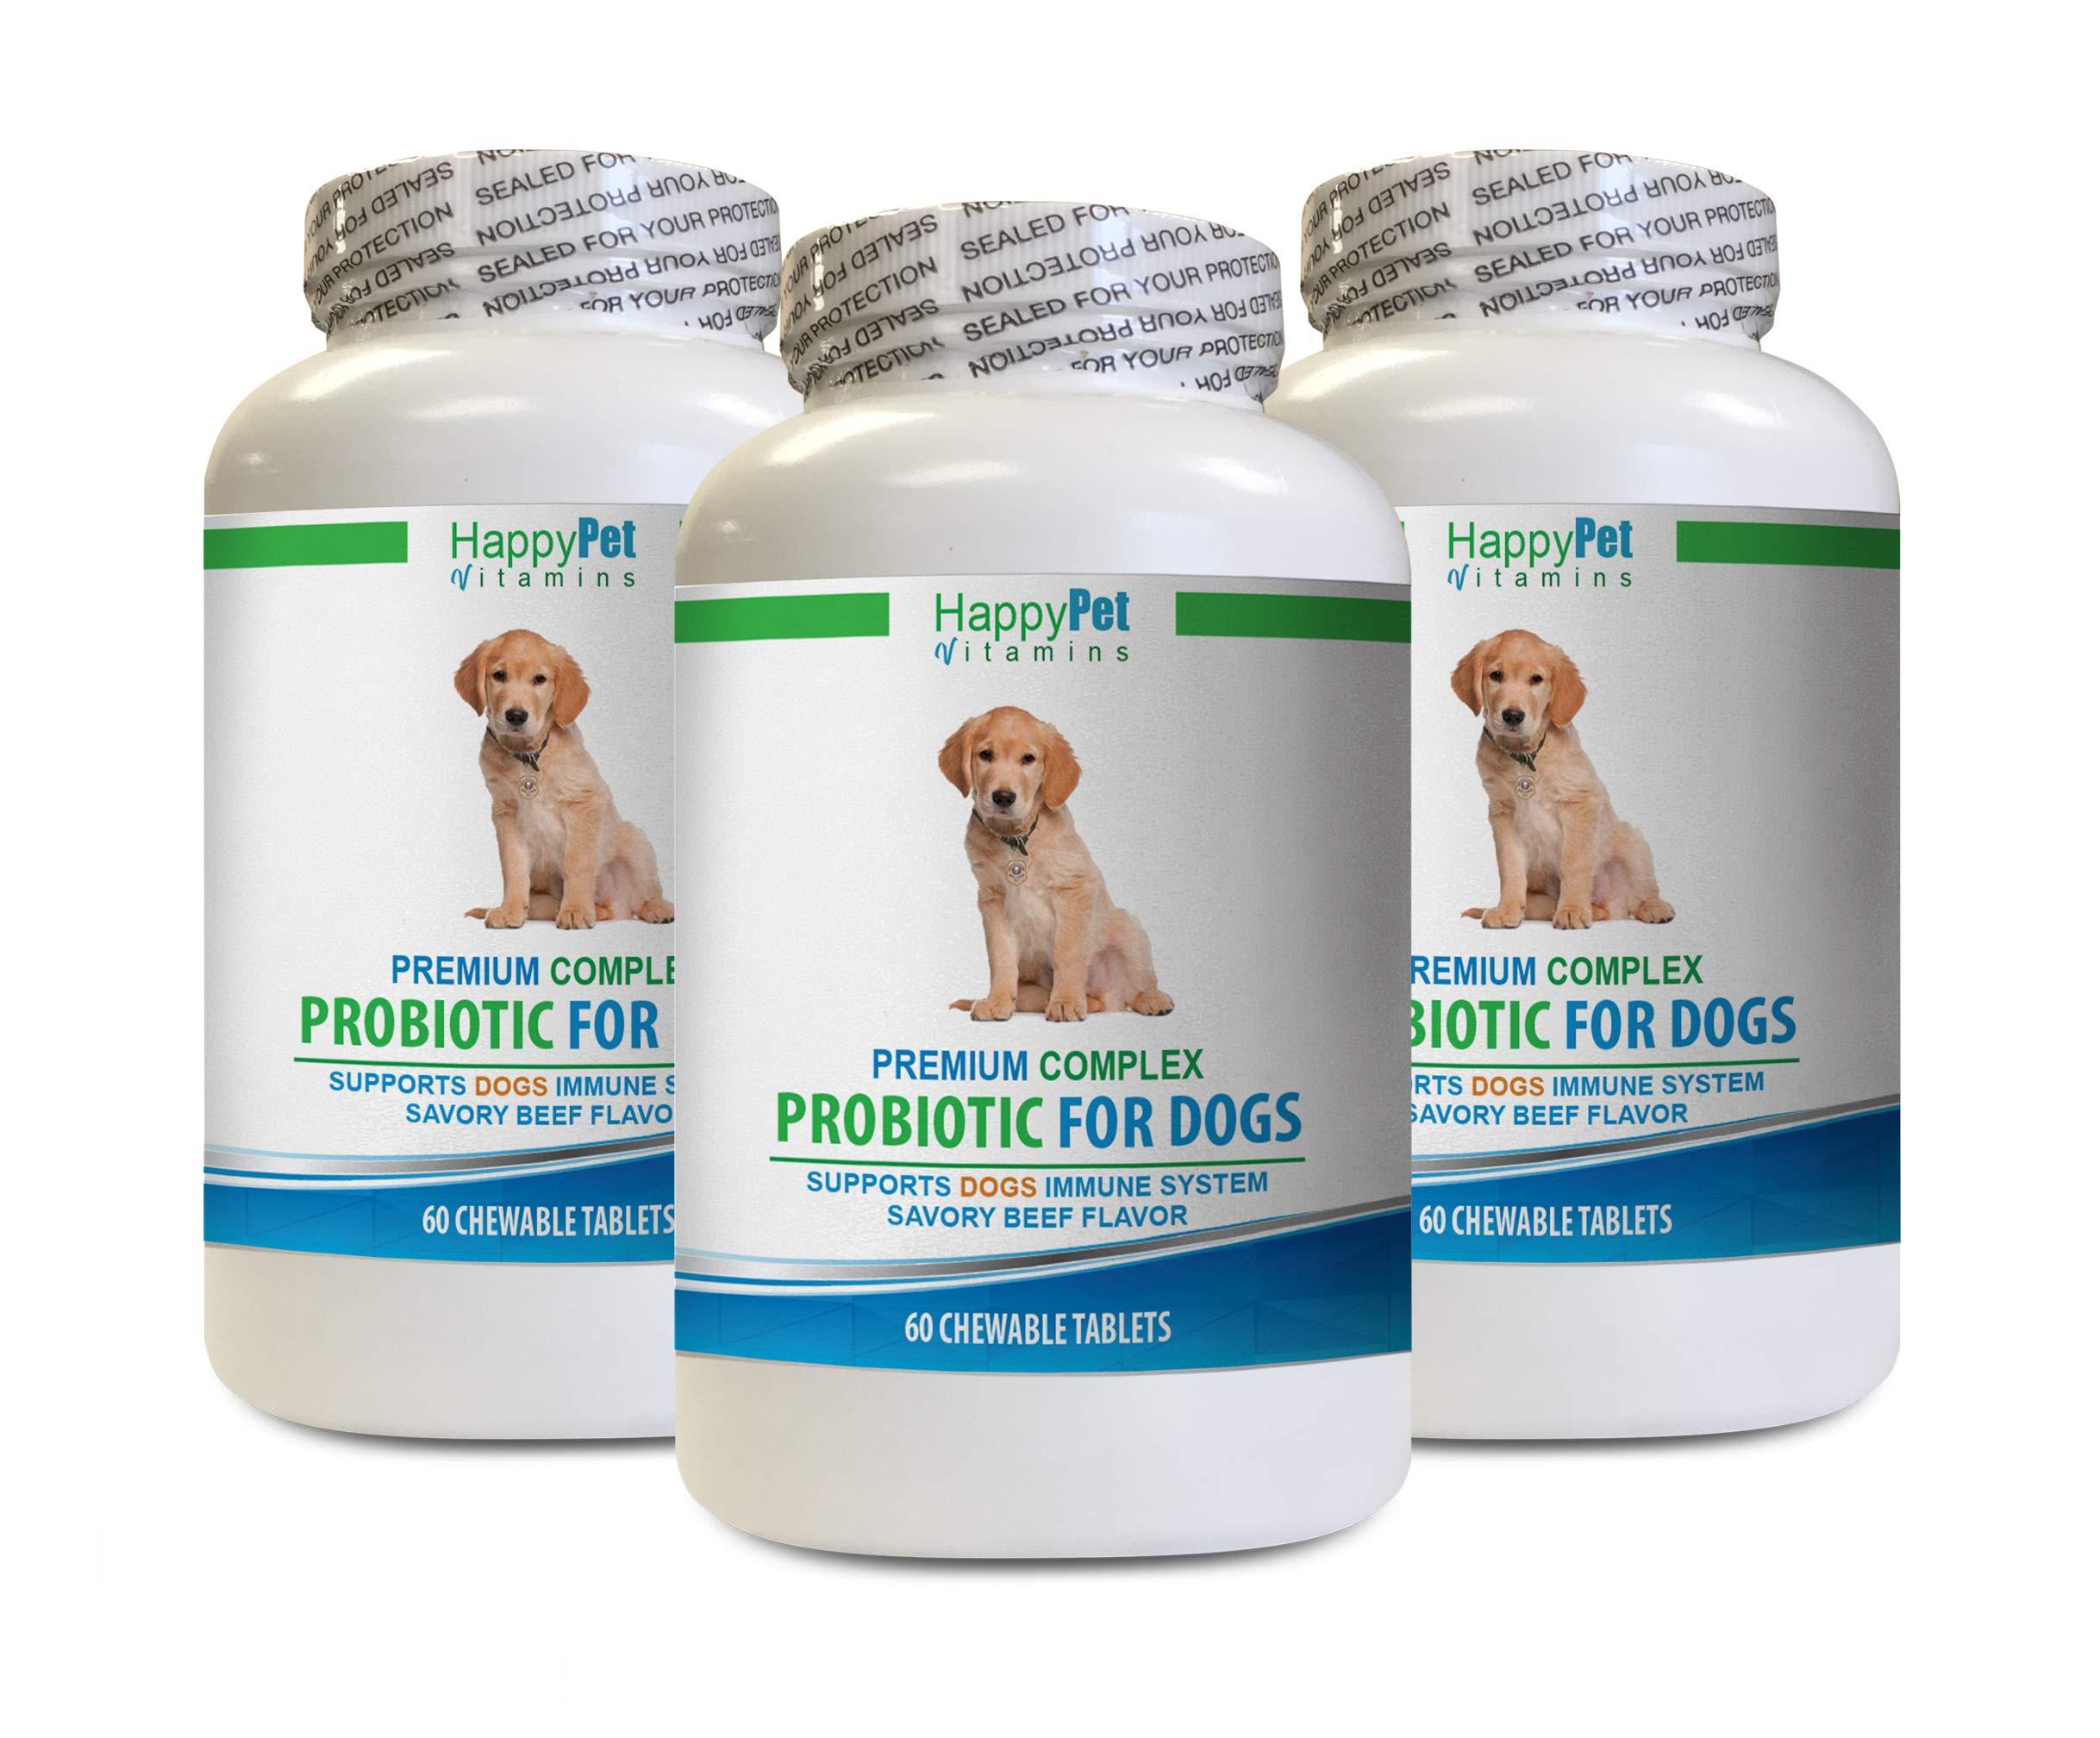 HAPPY PET VITAMINS LLC Dog Bad Breath Chews - Dog Premium PROBIOTICS - Savory Beef Flavor - Stops Diarrhea Bad Gas Bad Breath - Gut Health - Inulin Powder for Dogs - 3 Bottles (180 Treats) by HAPPY PET VITAMINS LLC